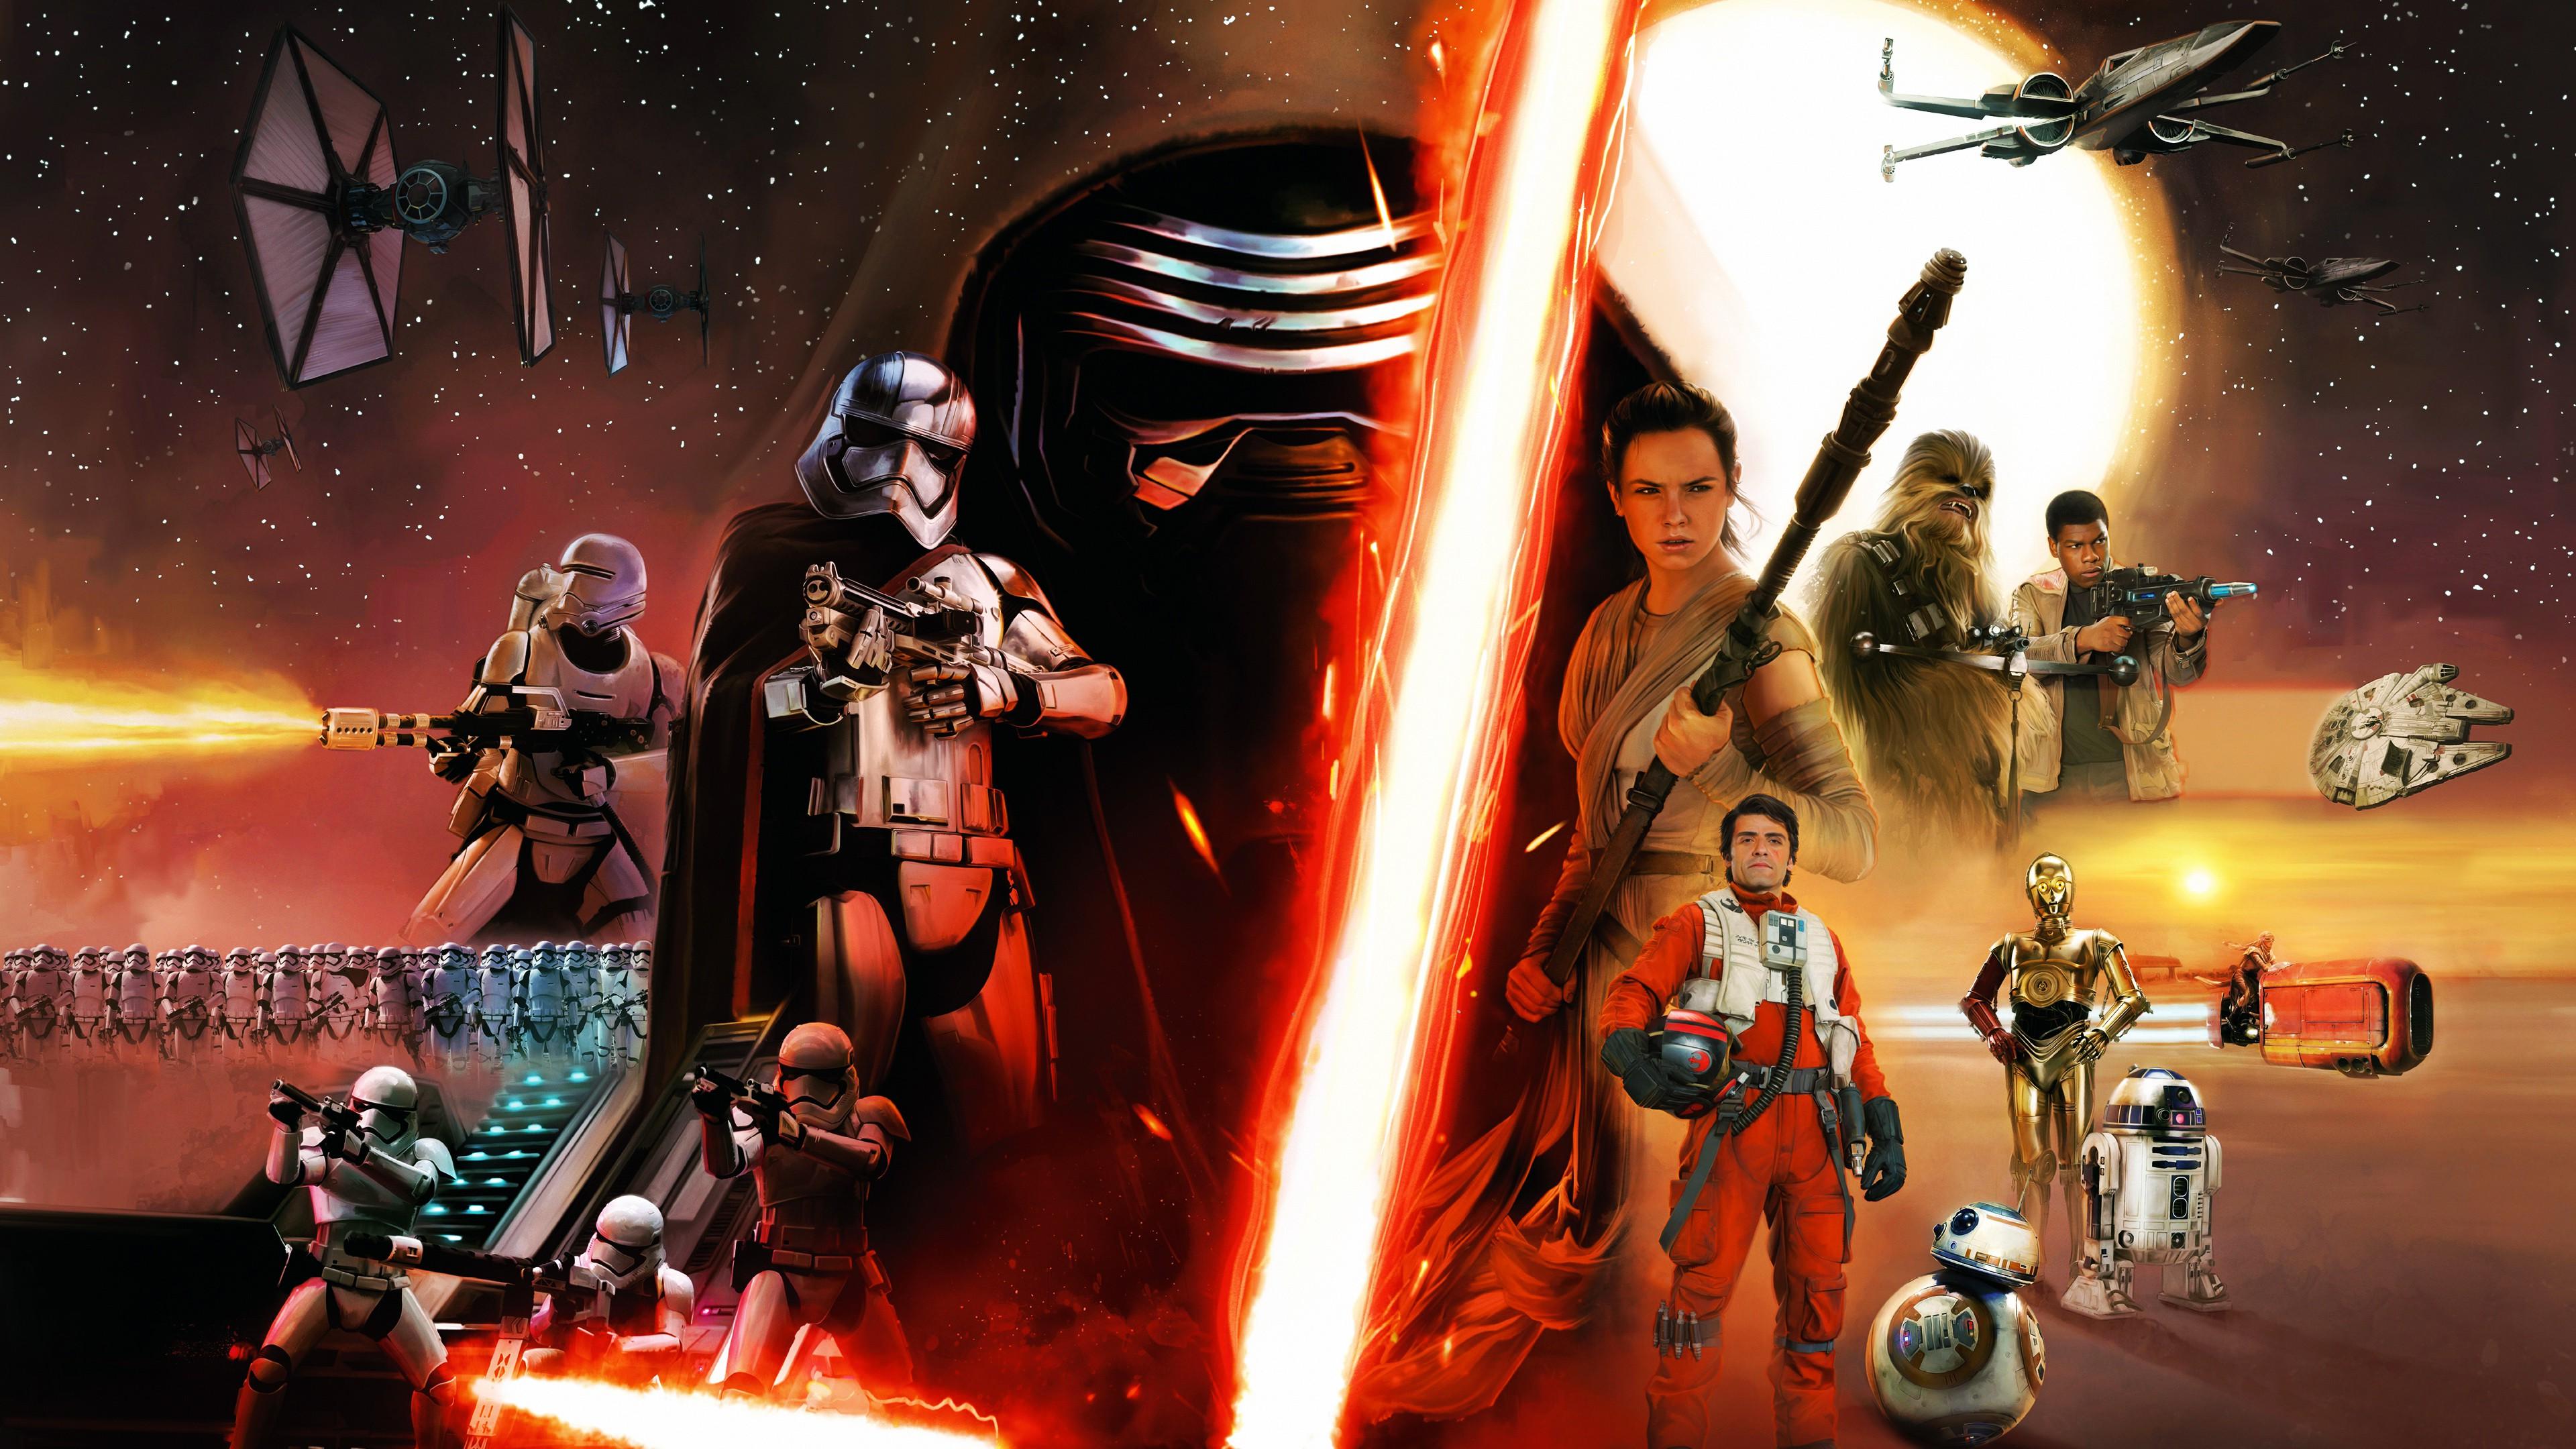 Star Wars Episode Vii The Force Awakens Hd 3840x2160 Download Hd Wallpaper Wallpapertip